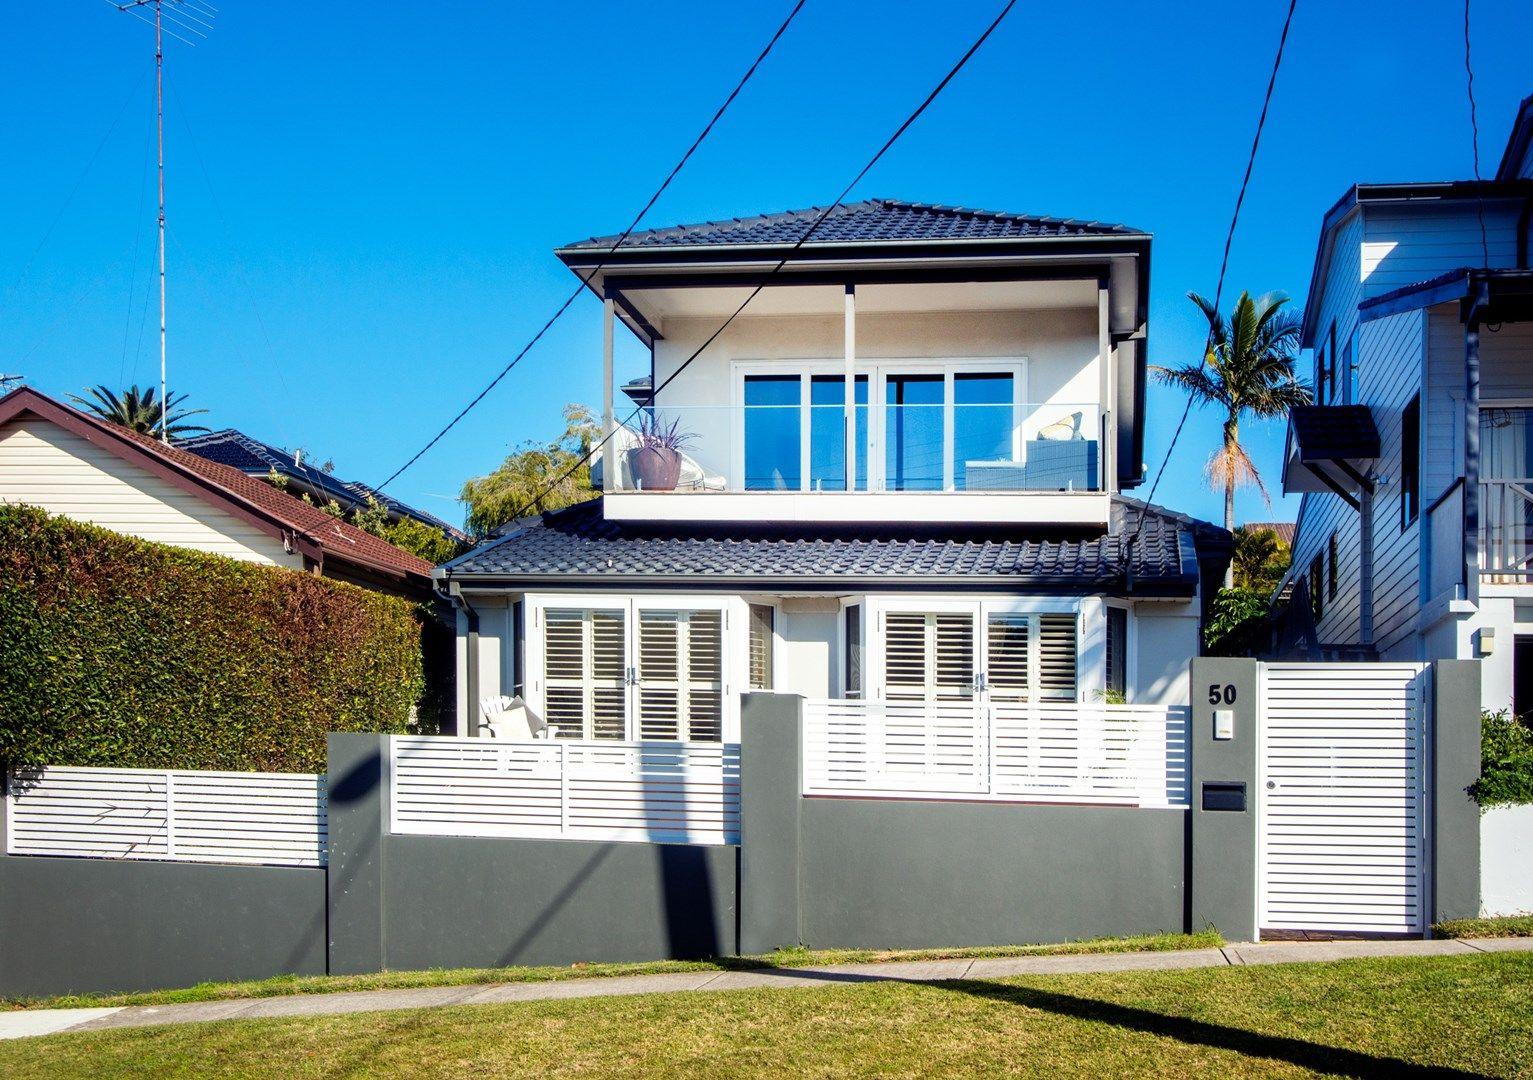 50 Victoria  Street, Malabar NSW 2036, Image 0